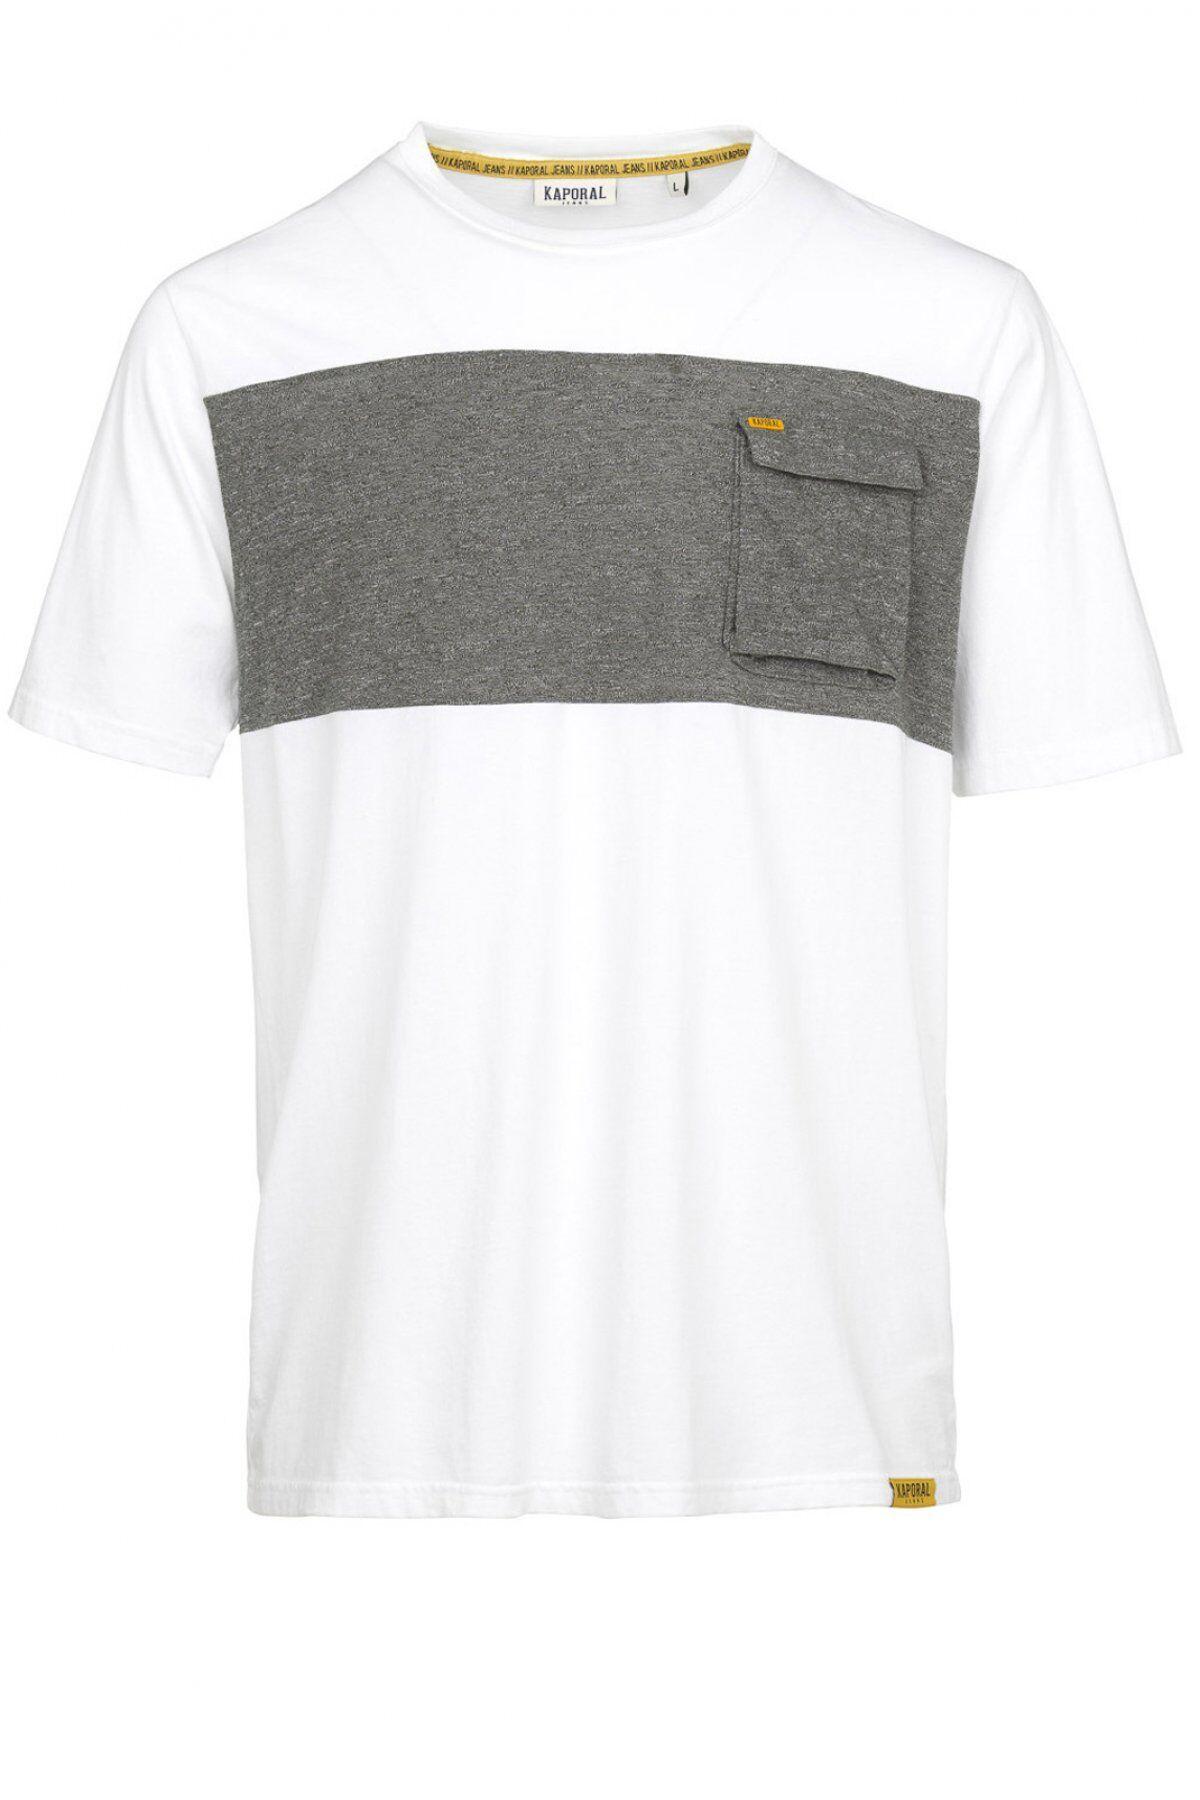 Kaporal Tee Shirt Coton Bicolore  -  Kaporal